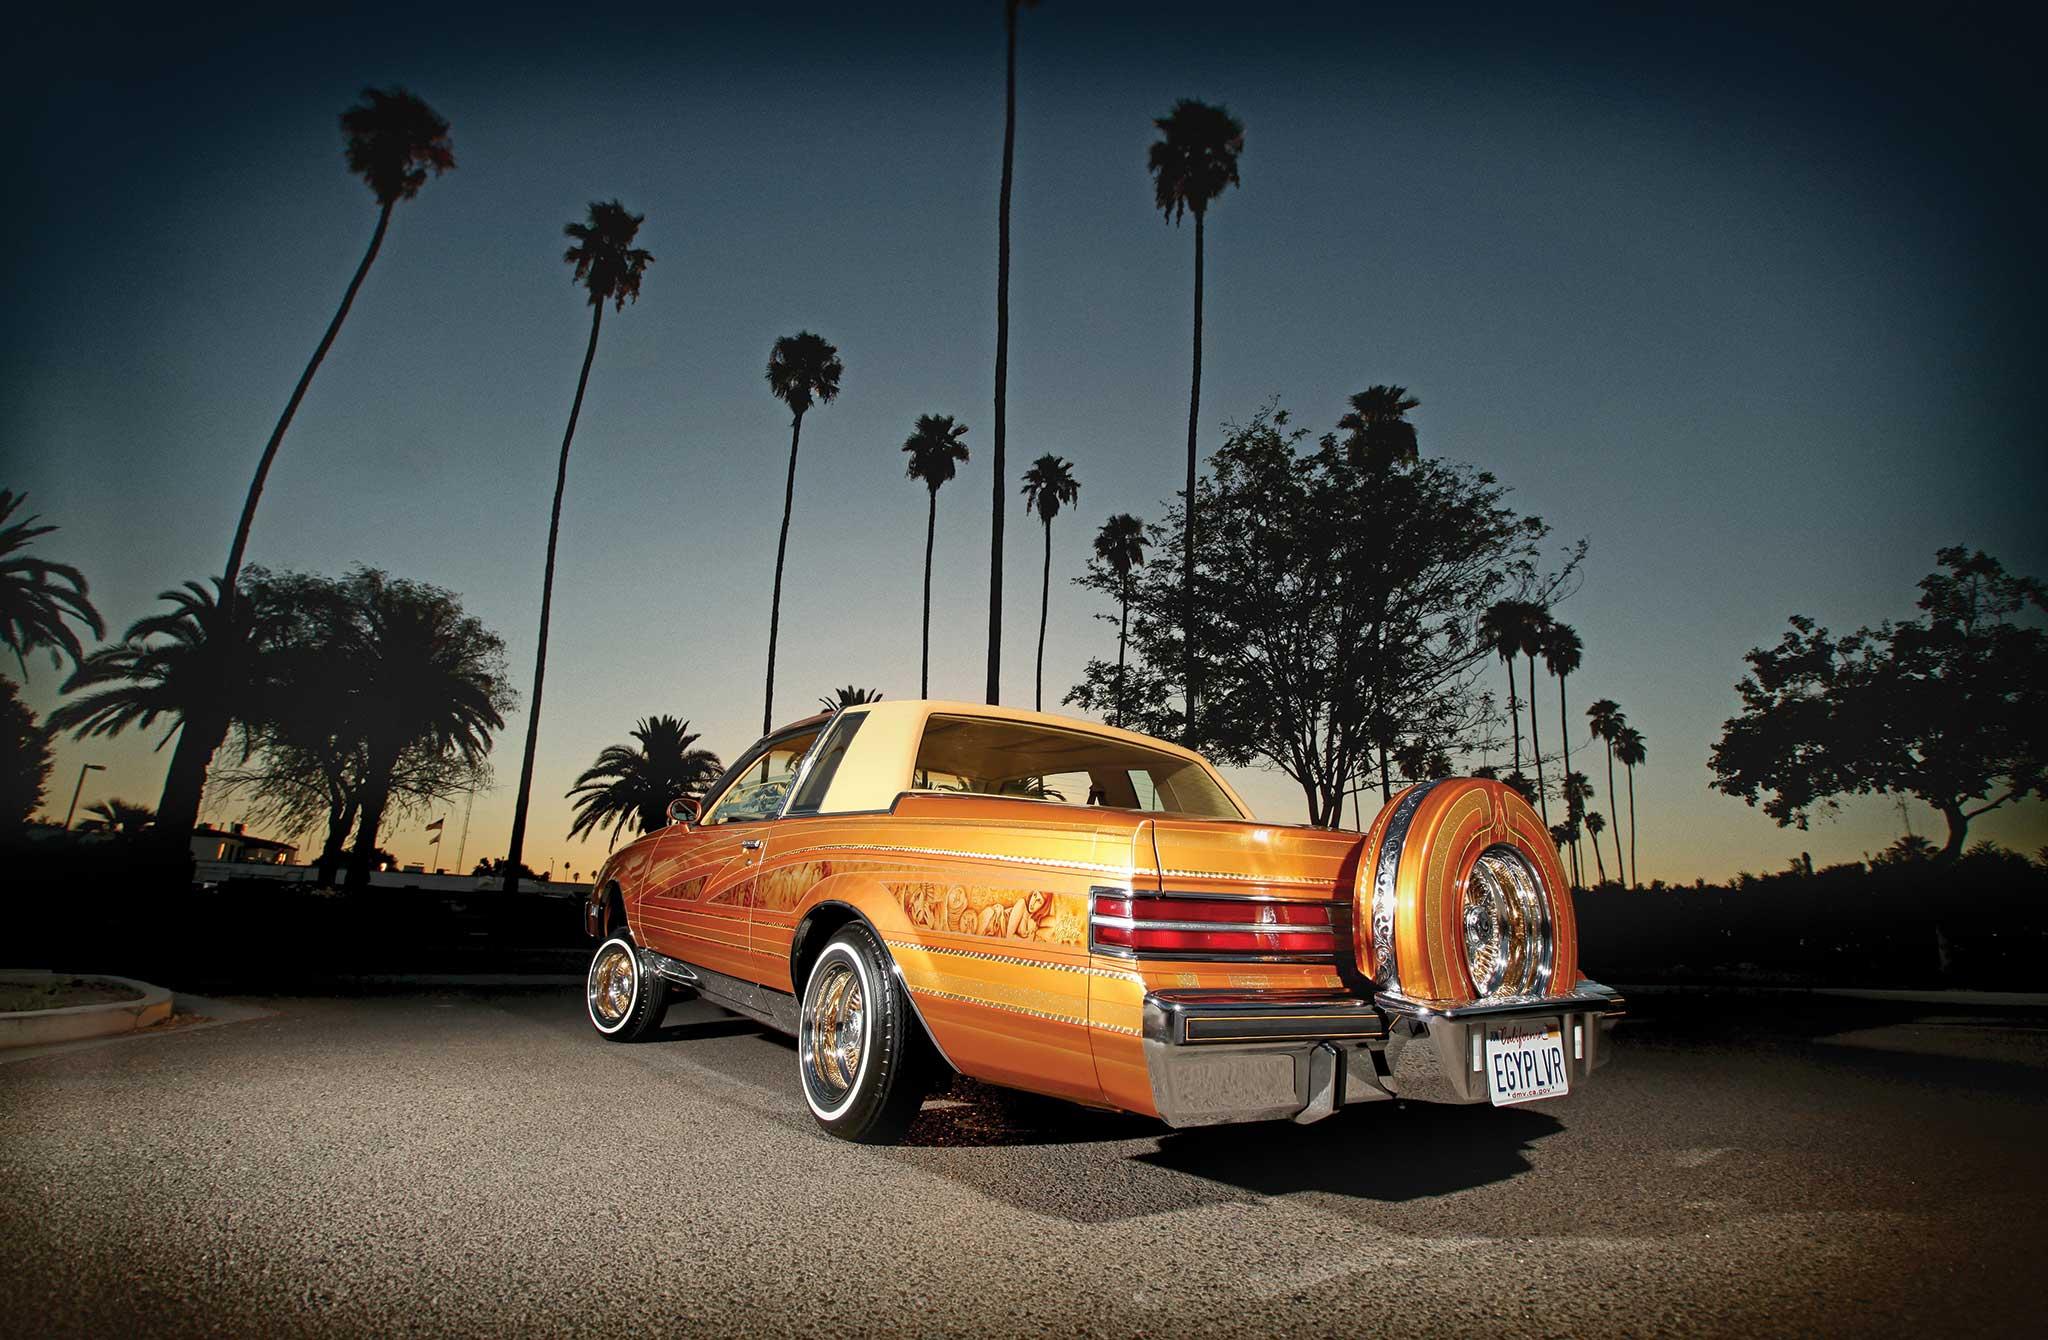 1986 buick regal passenger side rear quarter view 006